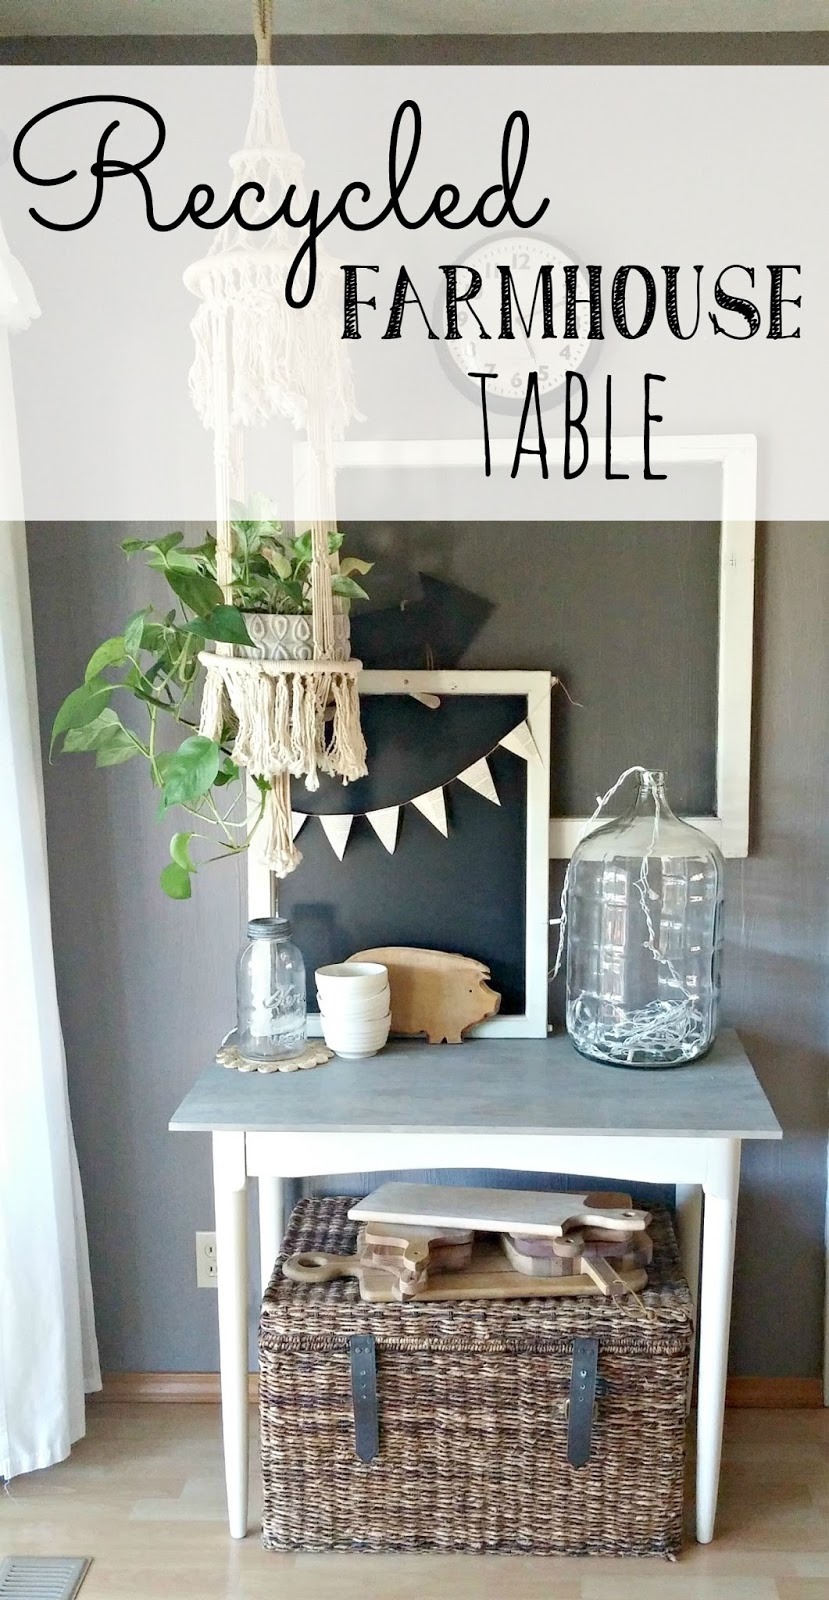 Recycled Farmhouse Table